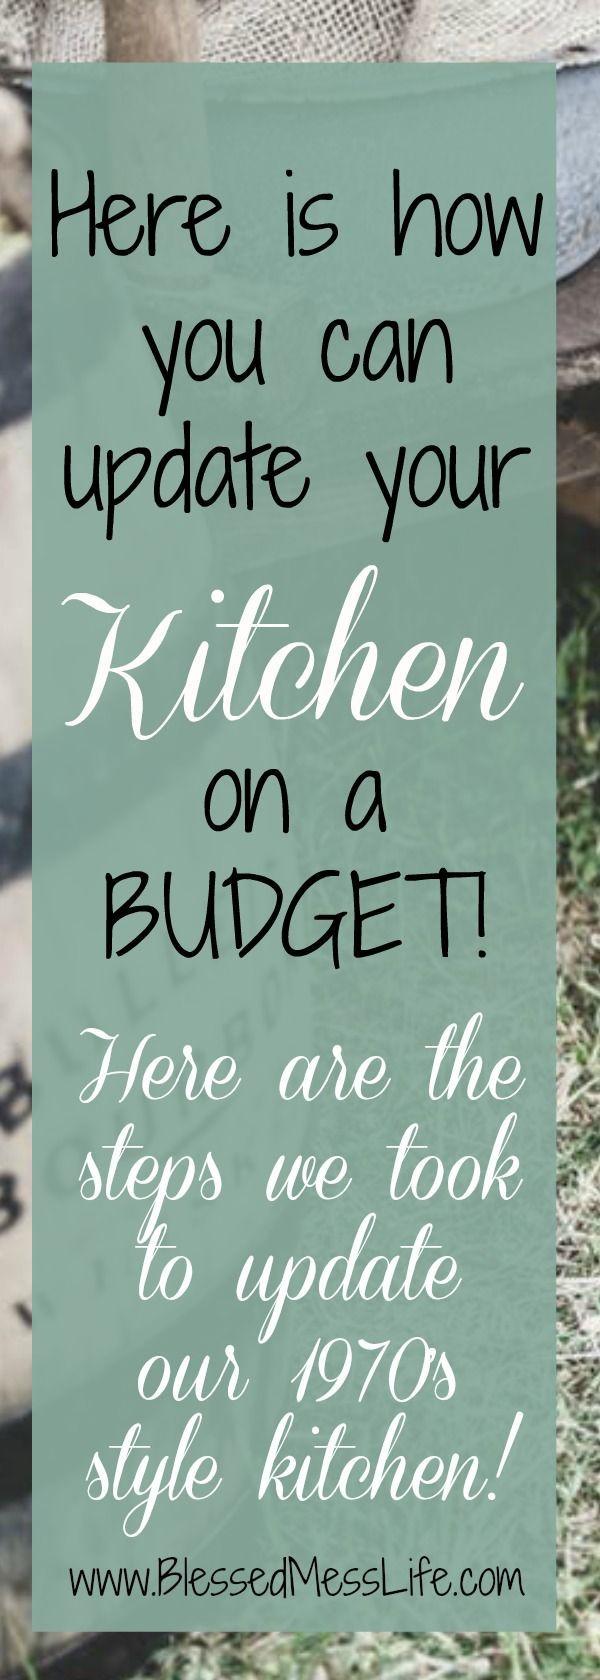 457 best Kitchen ideas images on Pinterest | Dream kitchens, White ...